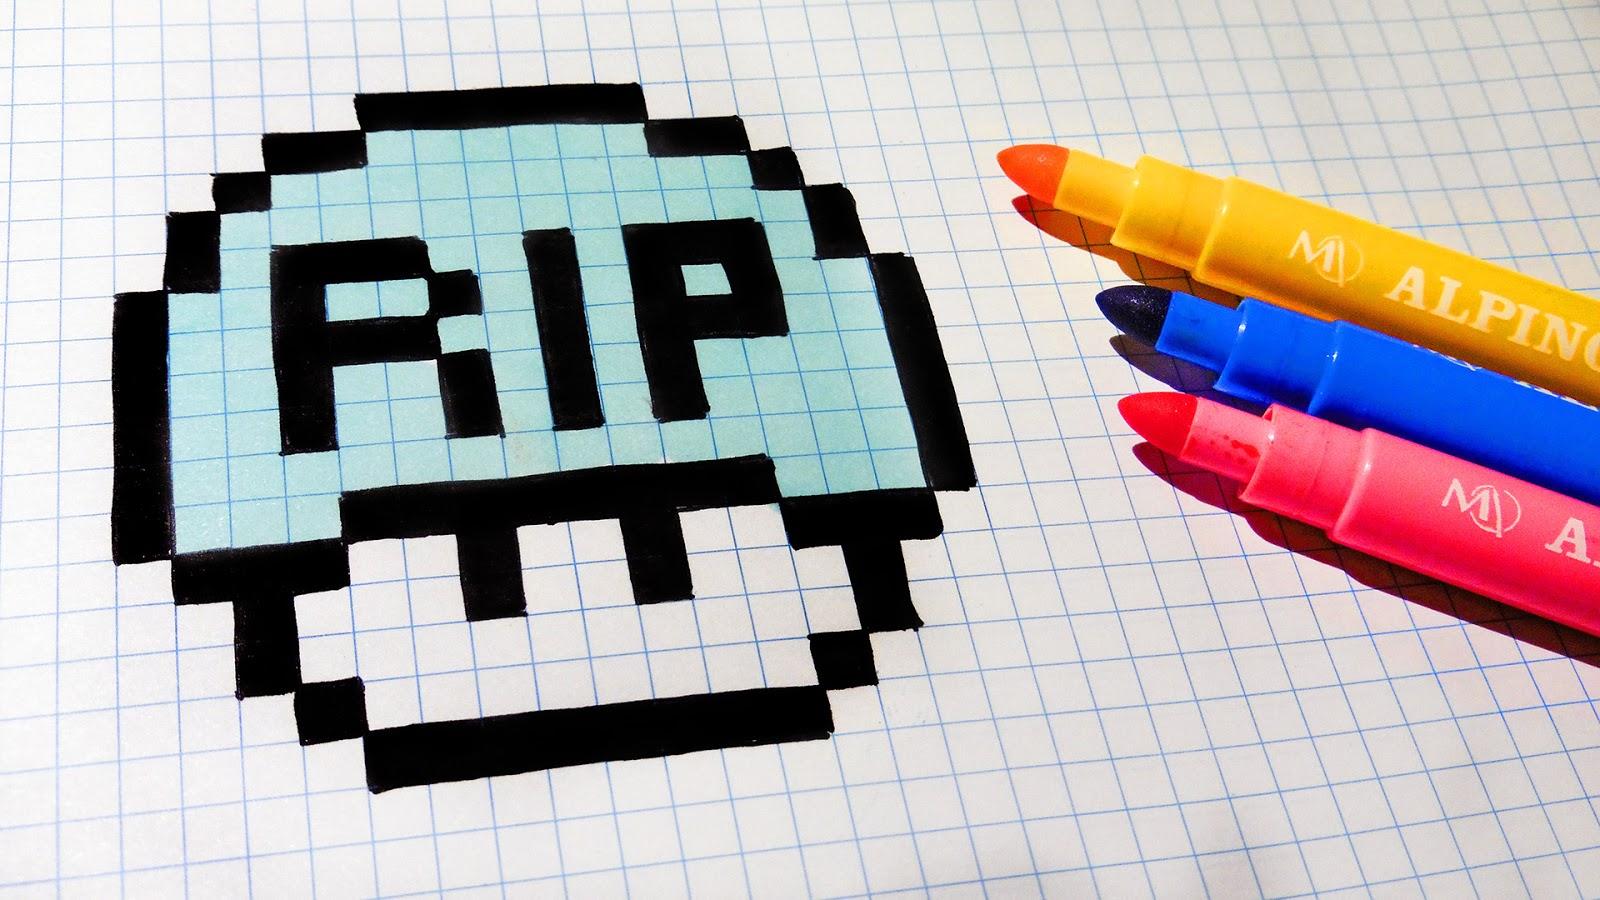 Halloween Pixel Art - How To Draw Tomb Mushroom #pixelart | Hello ...